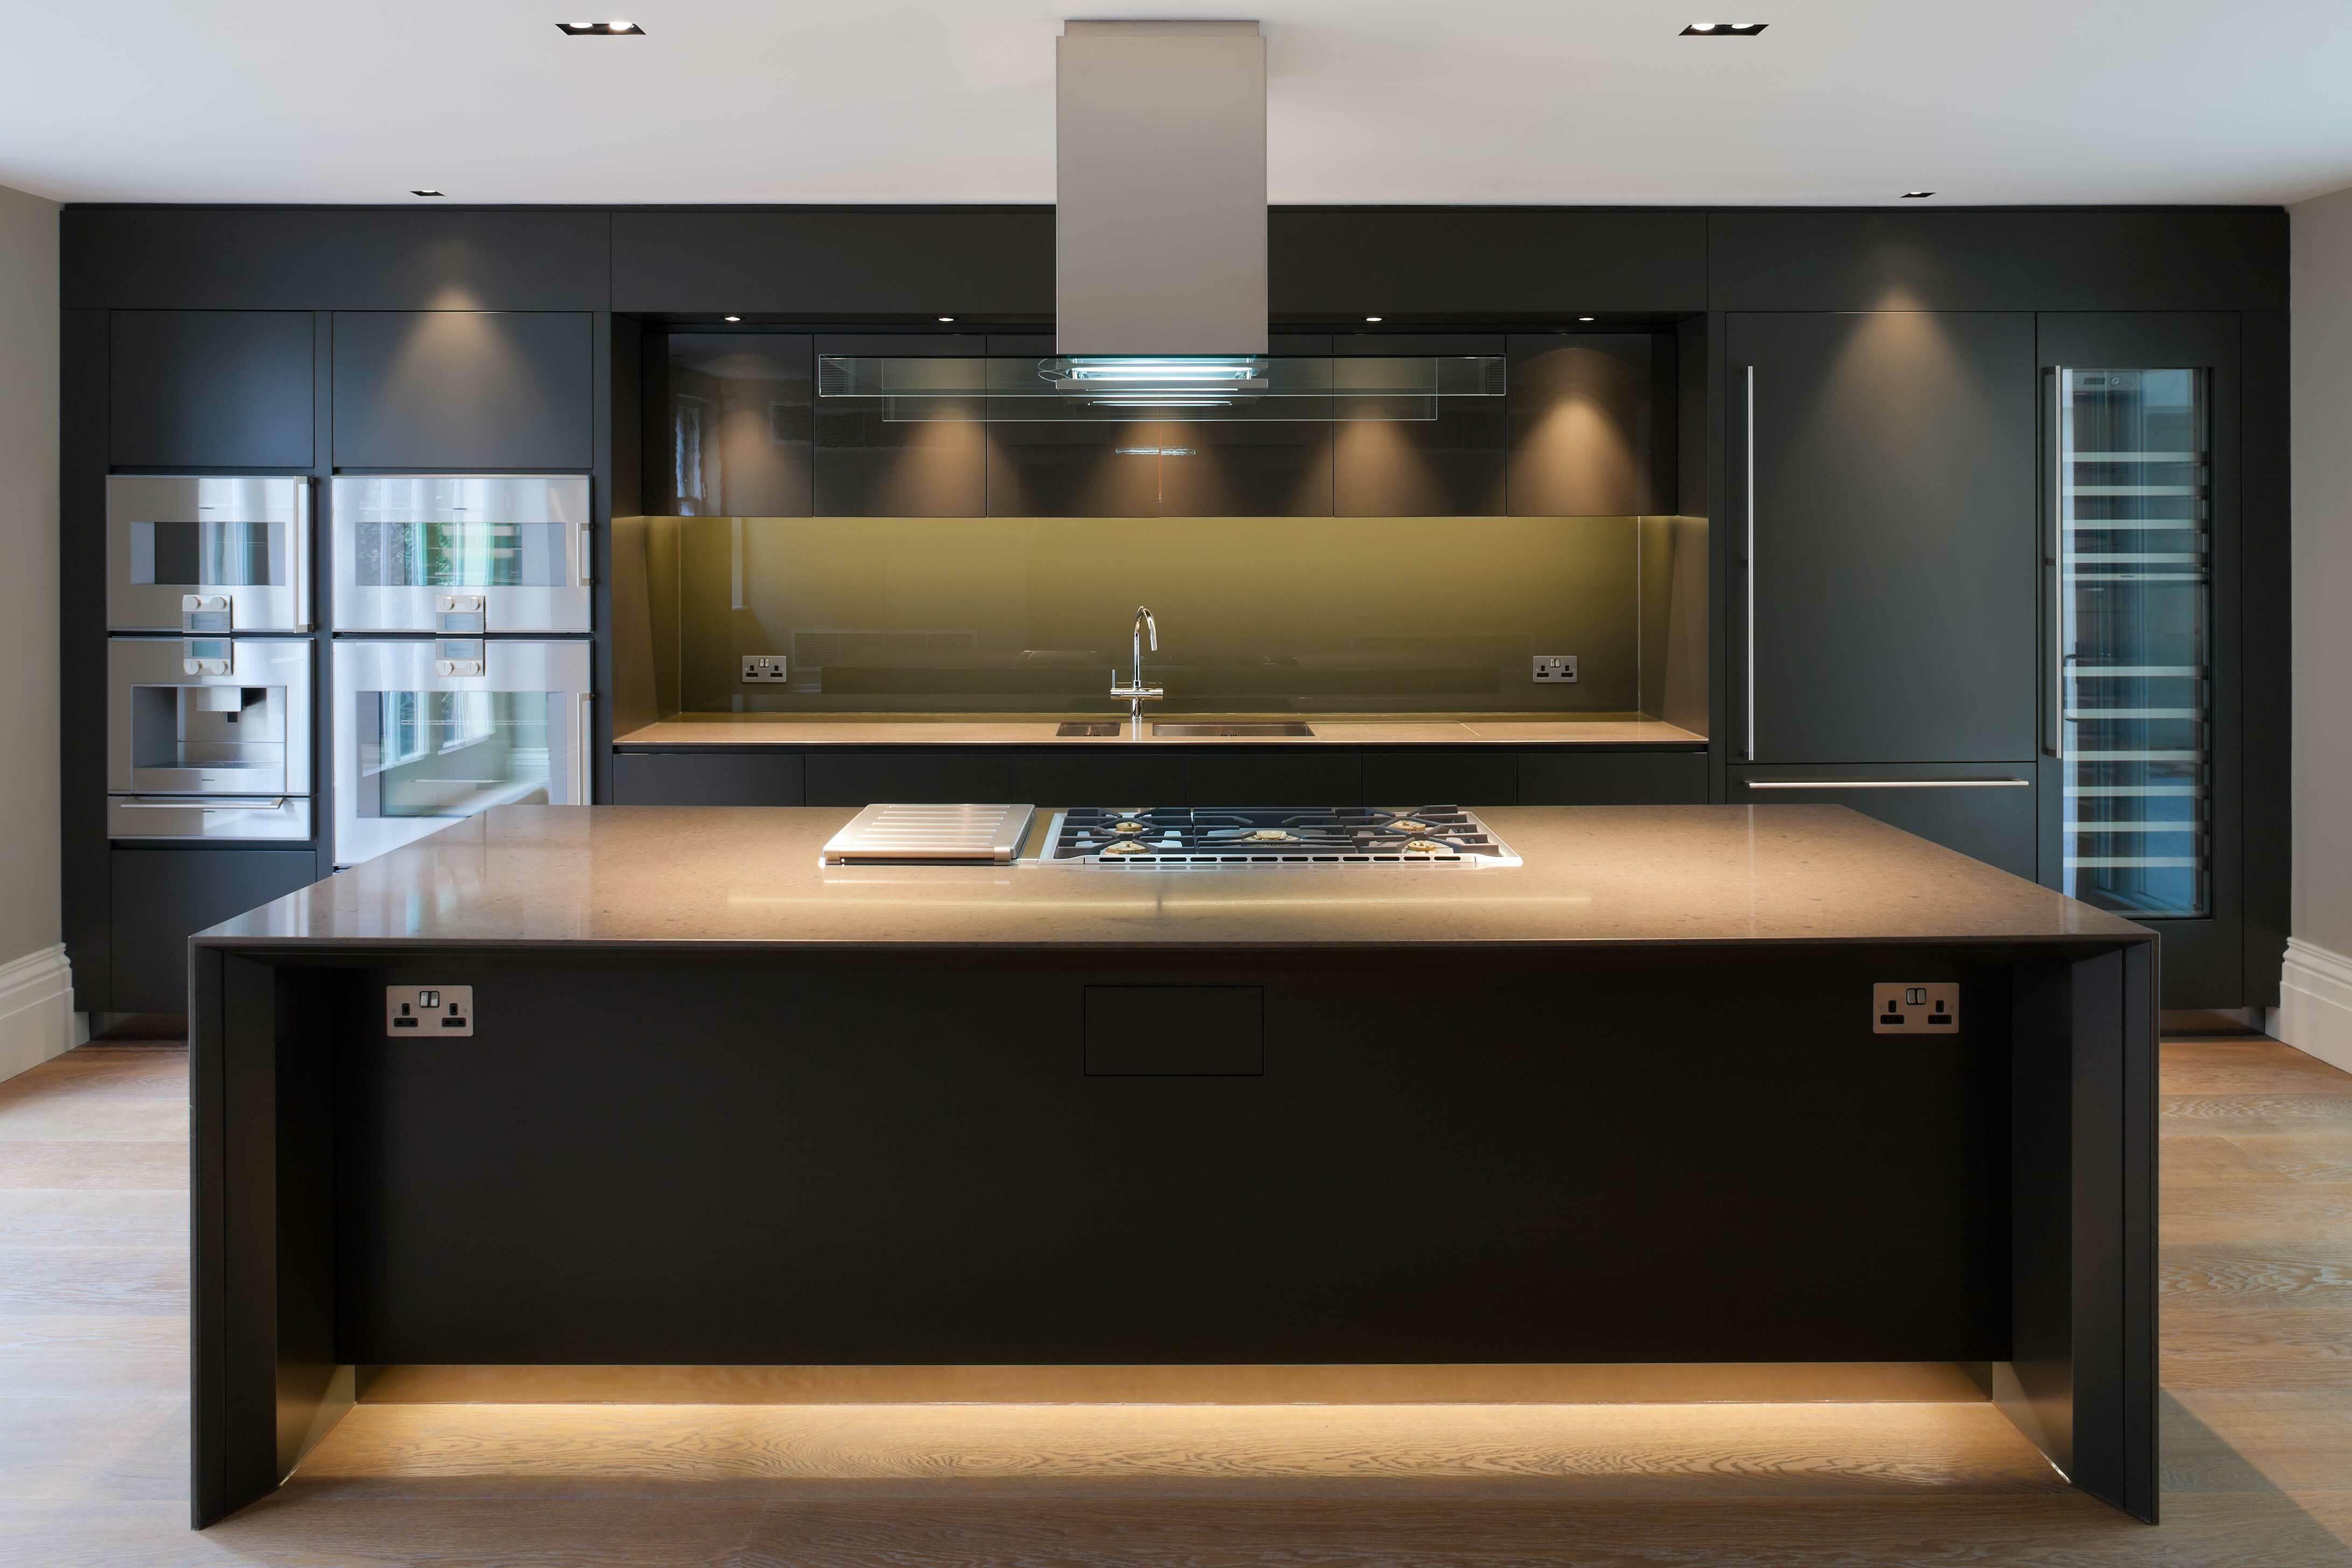 Kitchens_17.jpg